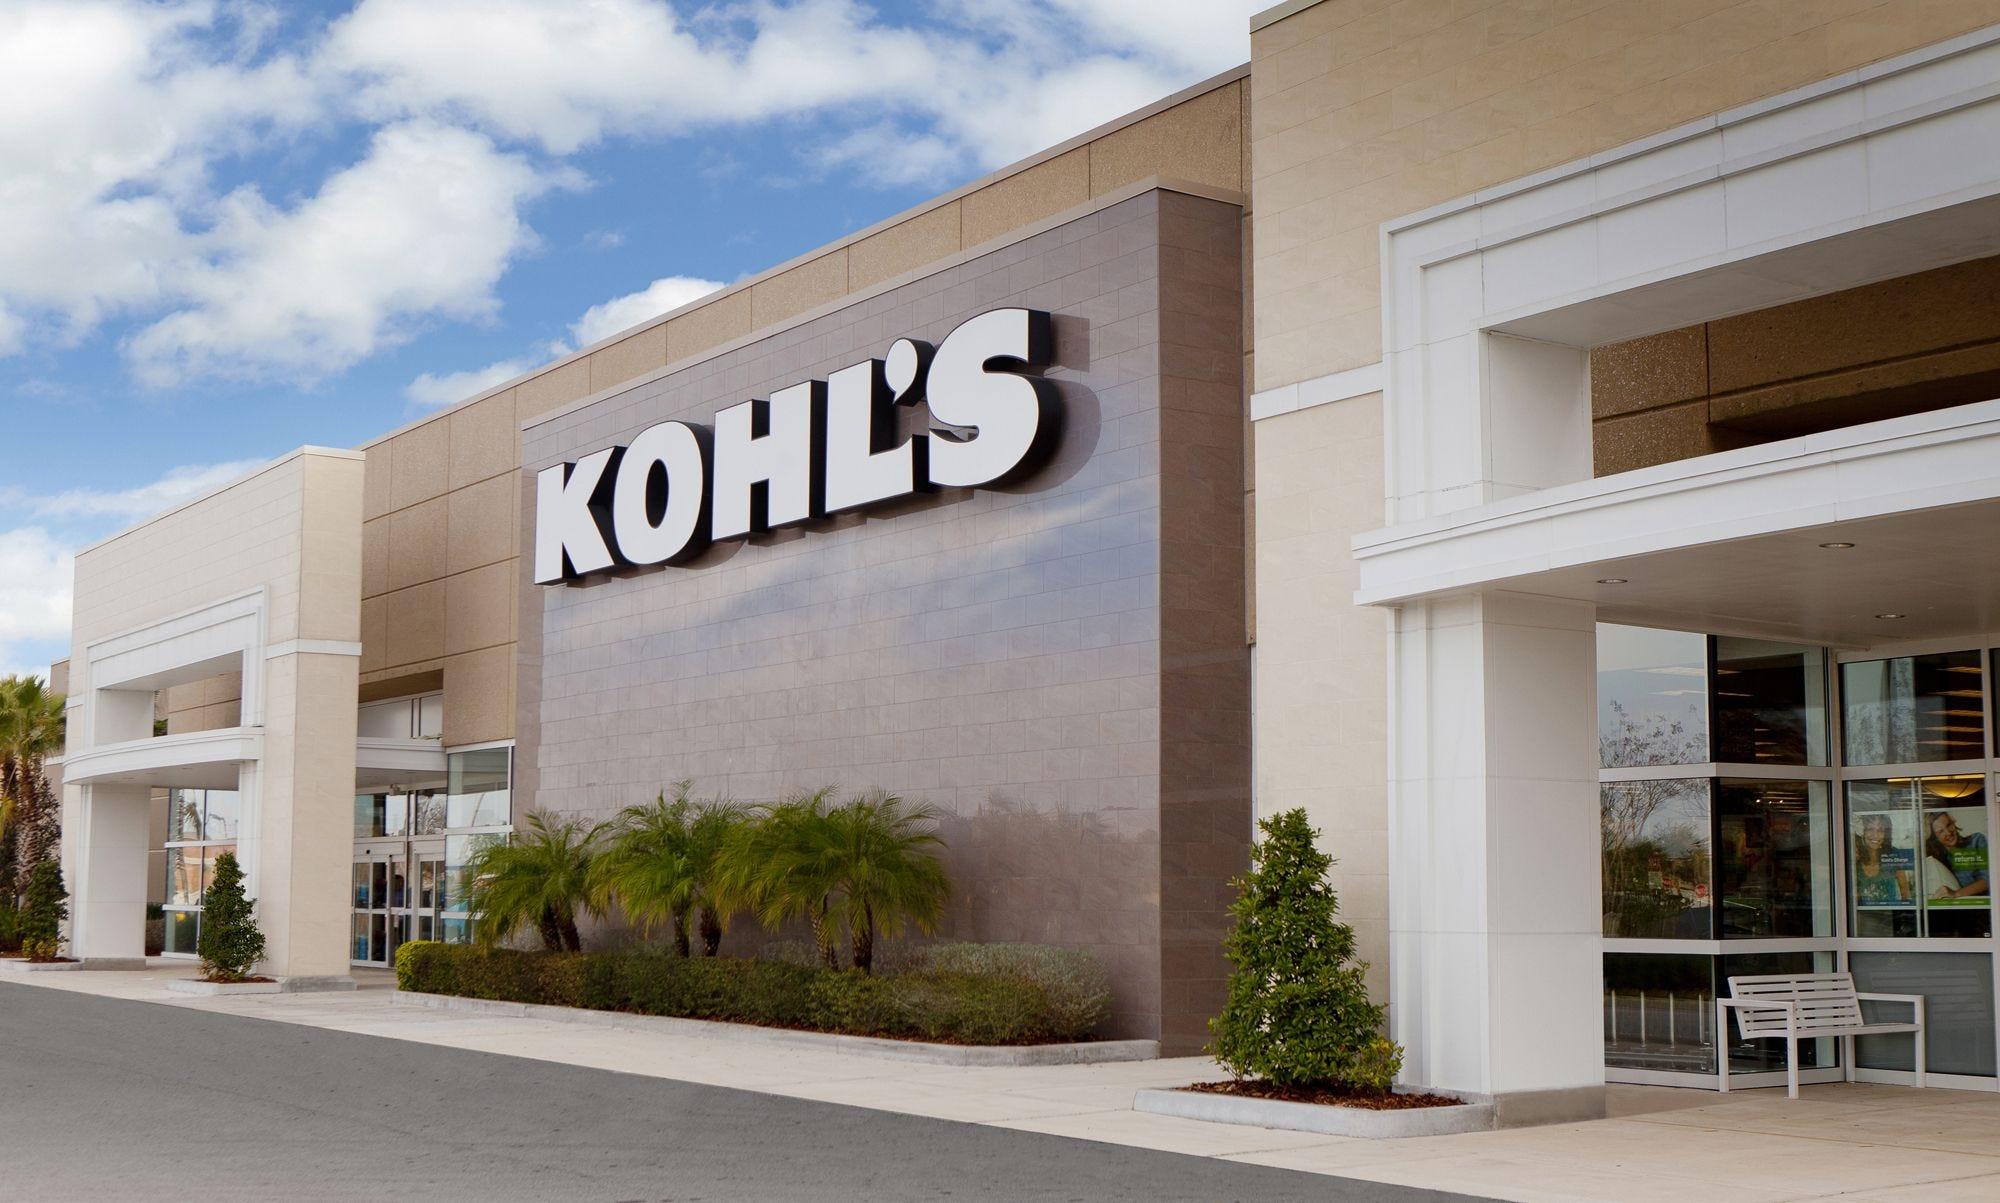 Kohl's offering free returns on Amazon items